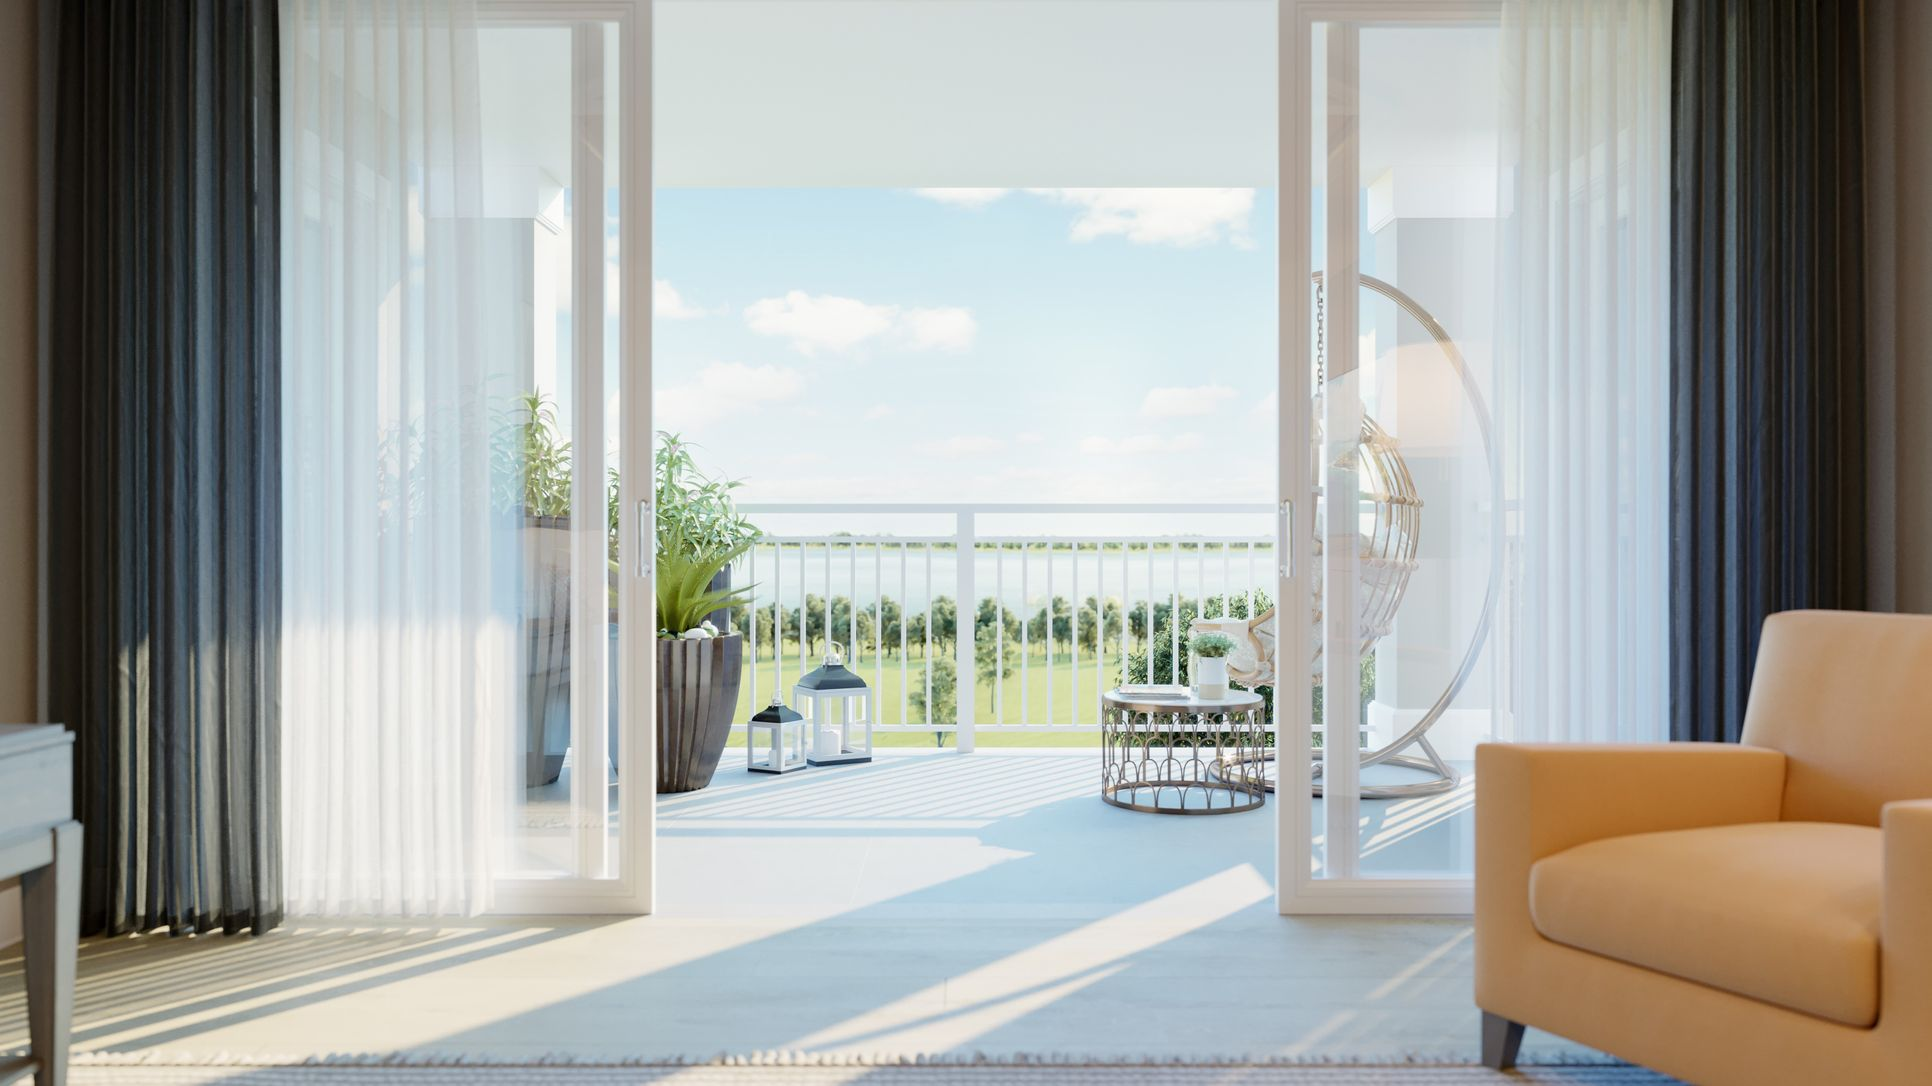 Interior:Balcony for outdoor living